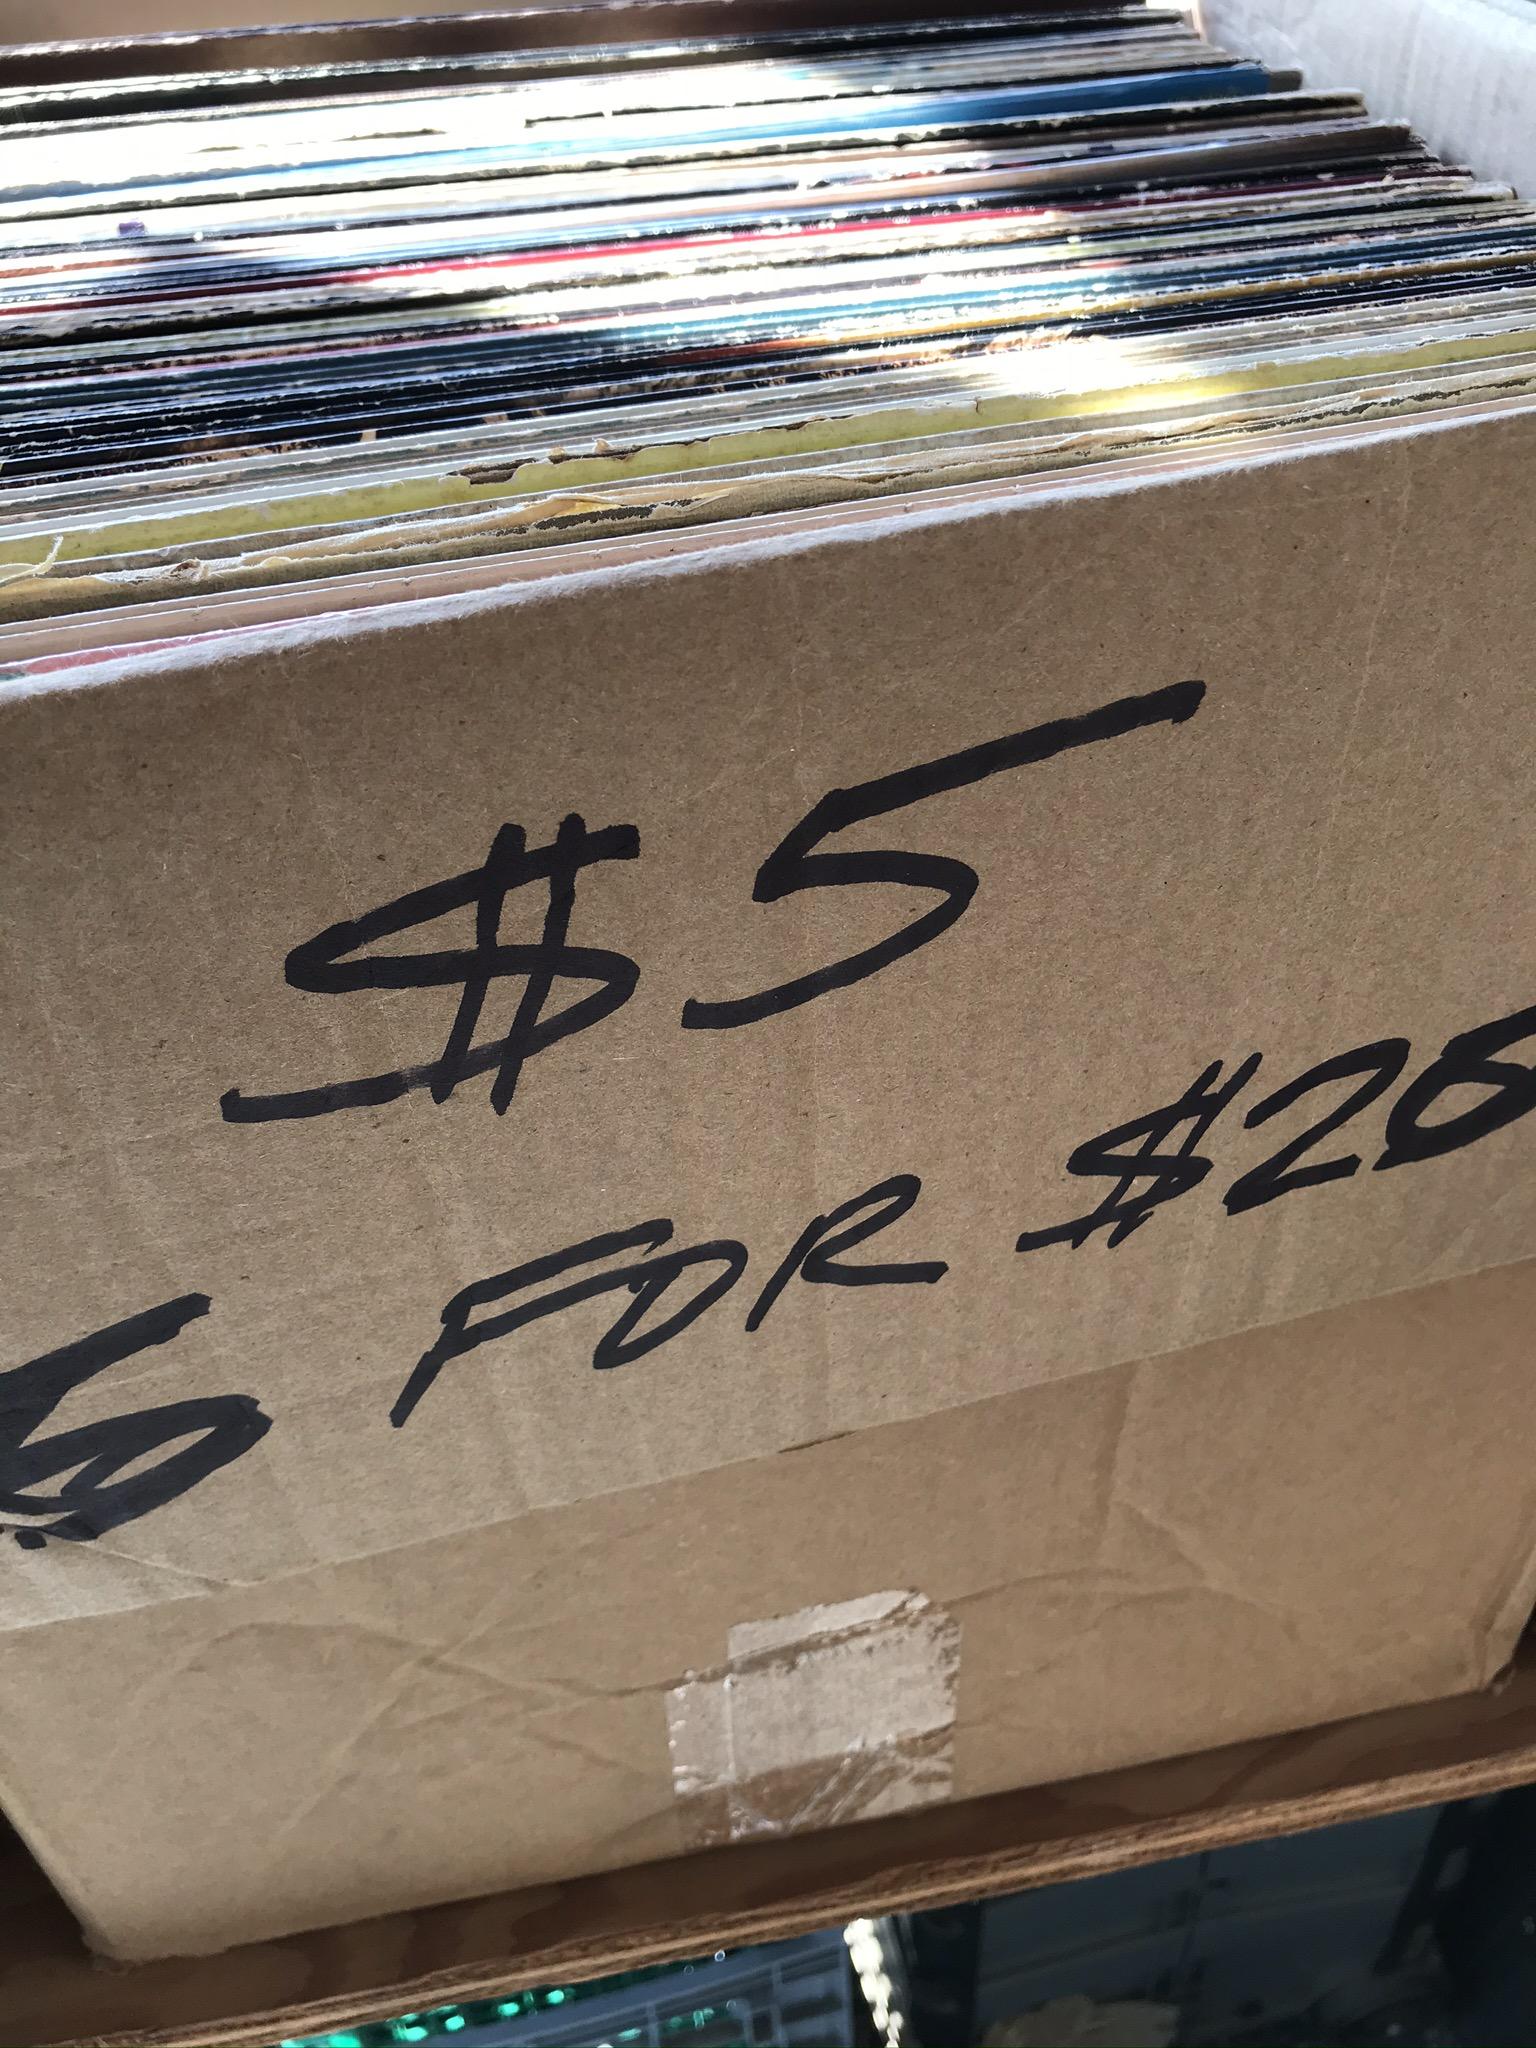 $5 Records